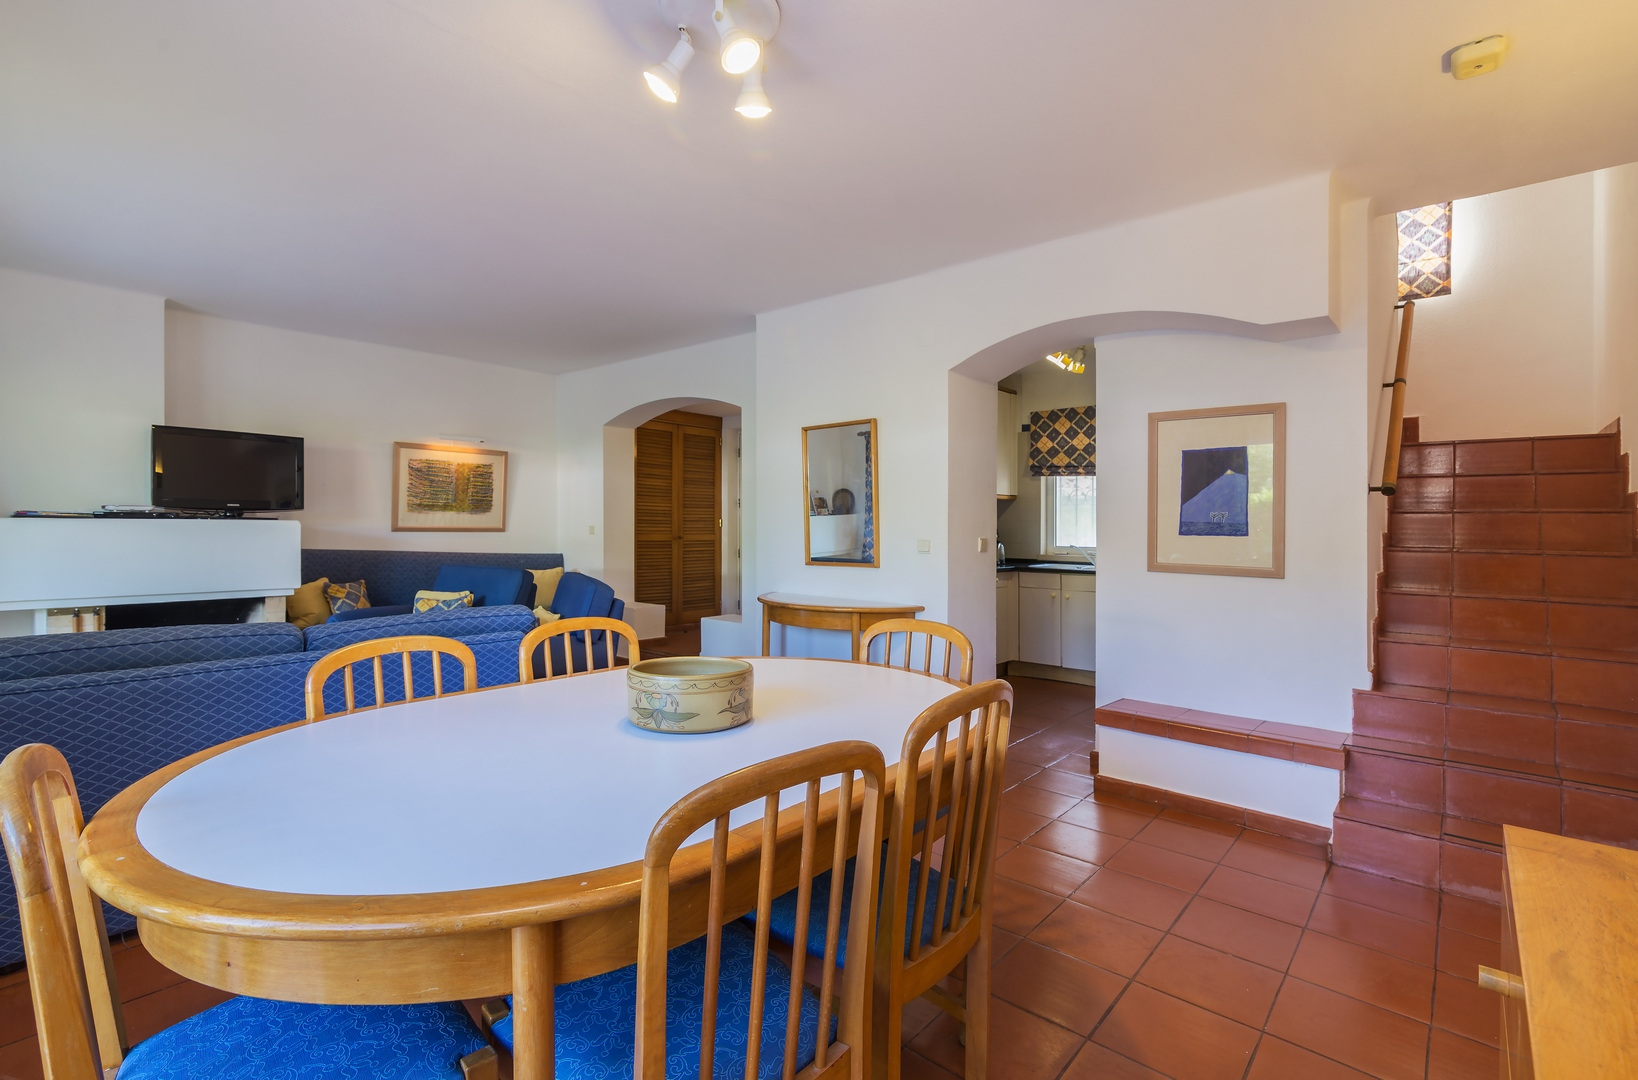 2 Bedroom Townhouse For Sale In Vilar do Golfe (3)